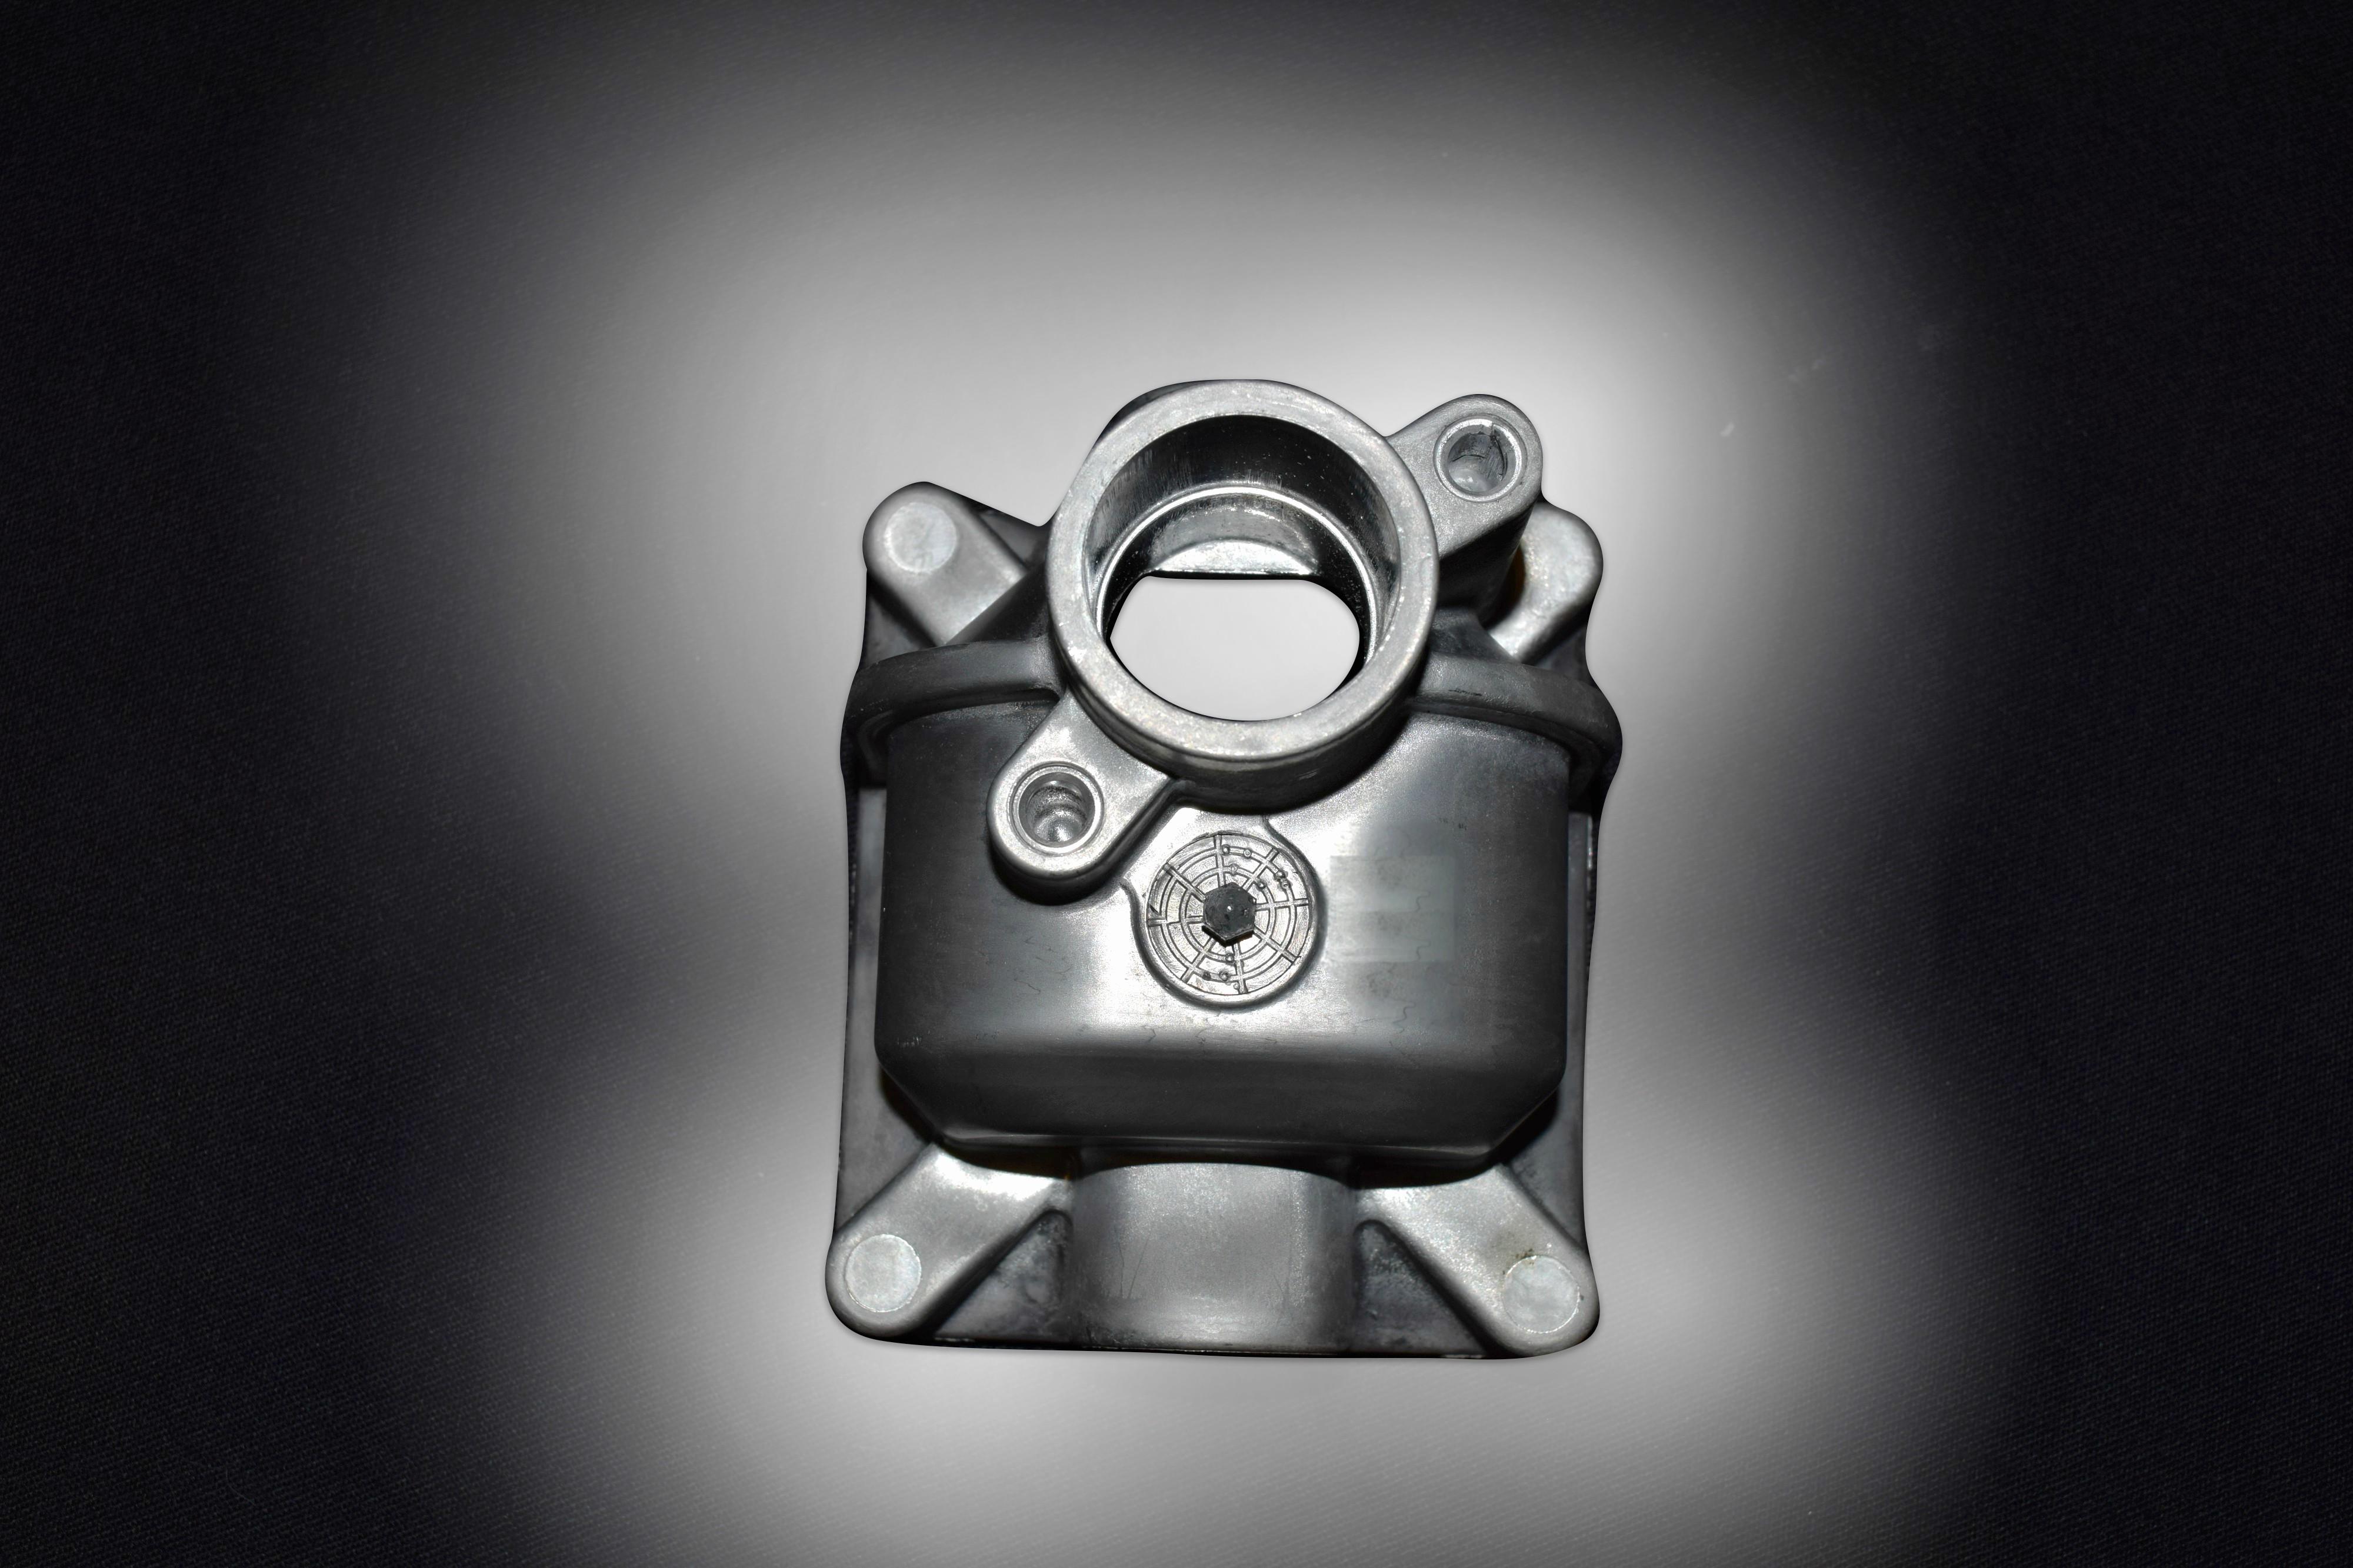 Automotive, Aluminum Die Casting, Small Casting (2), Small Casting Parts, Small Castings Examples